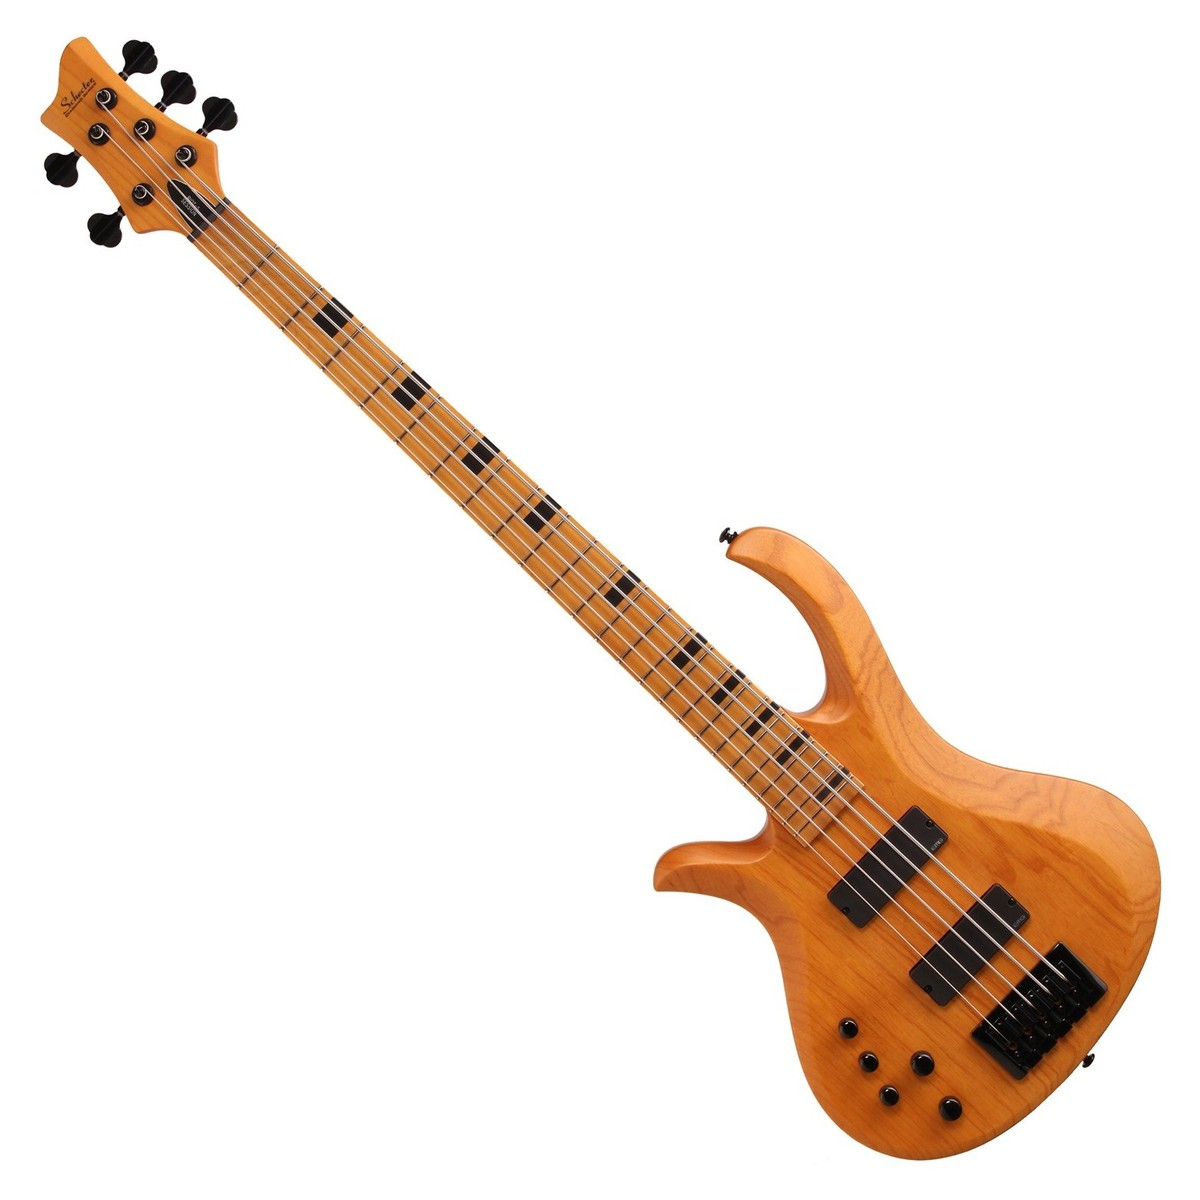 schecter riot session 5 left handed bass guitar aged natural satin at. Black Bedroom Furniture Sets. Home Design Ideas